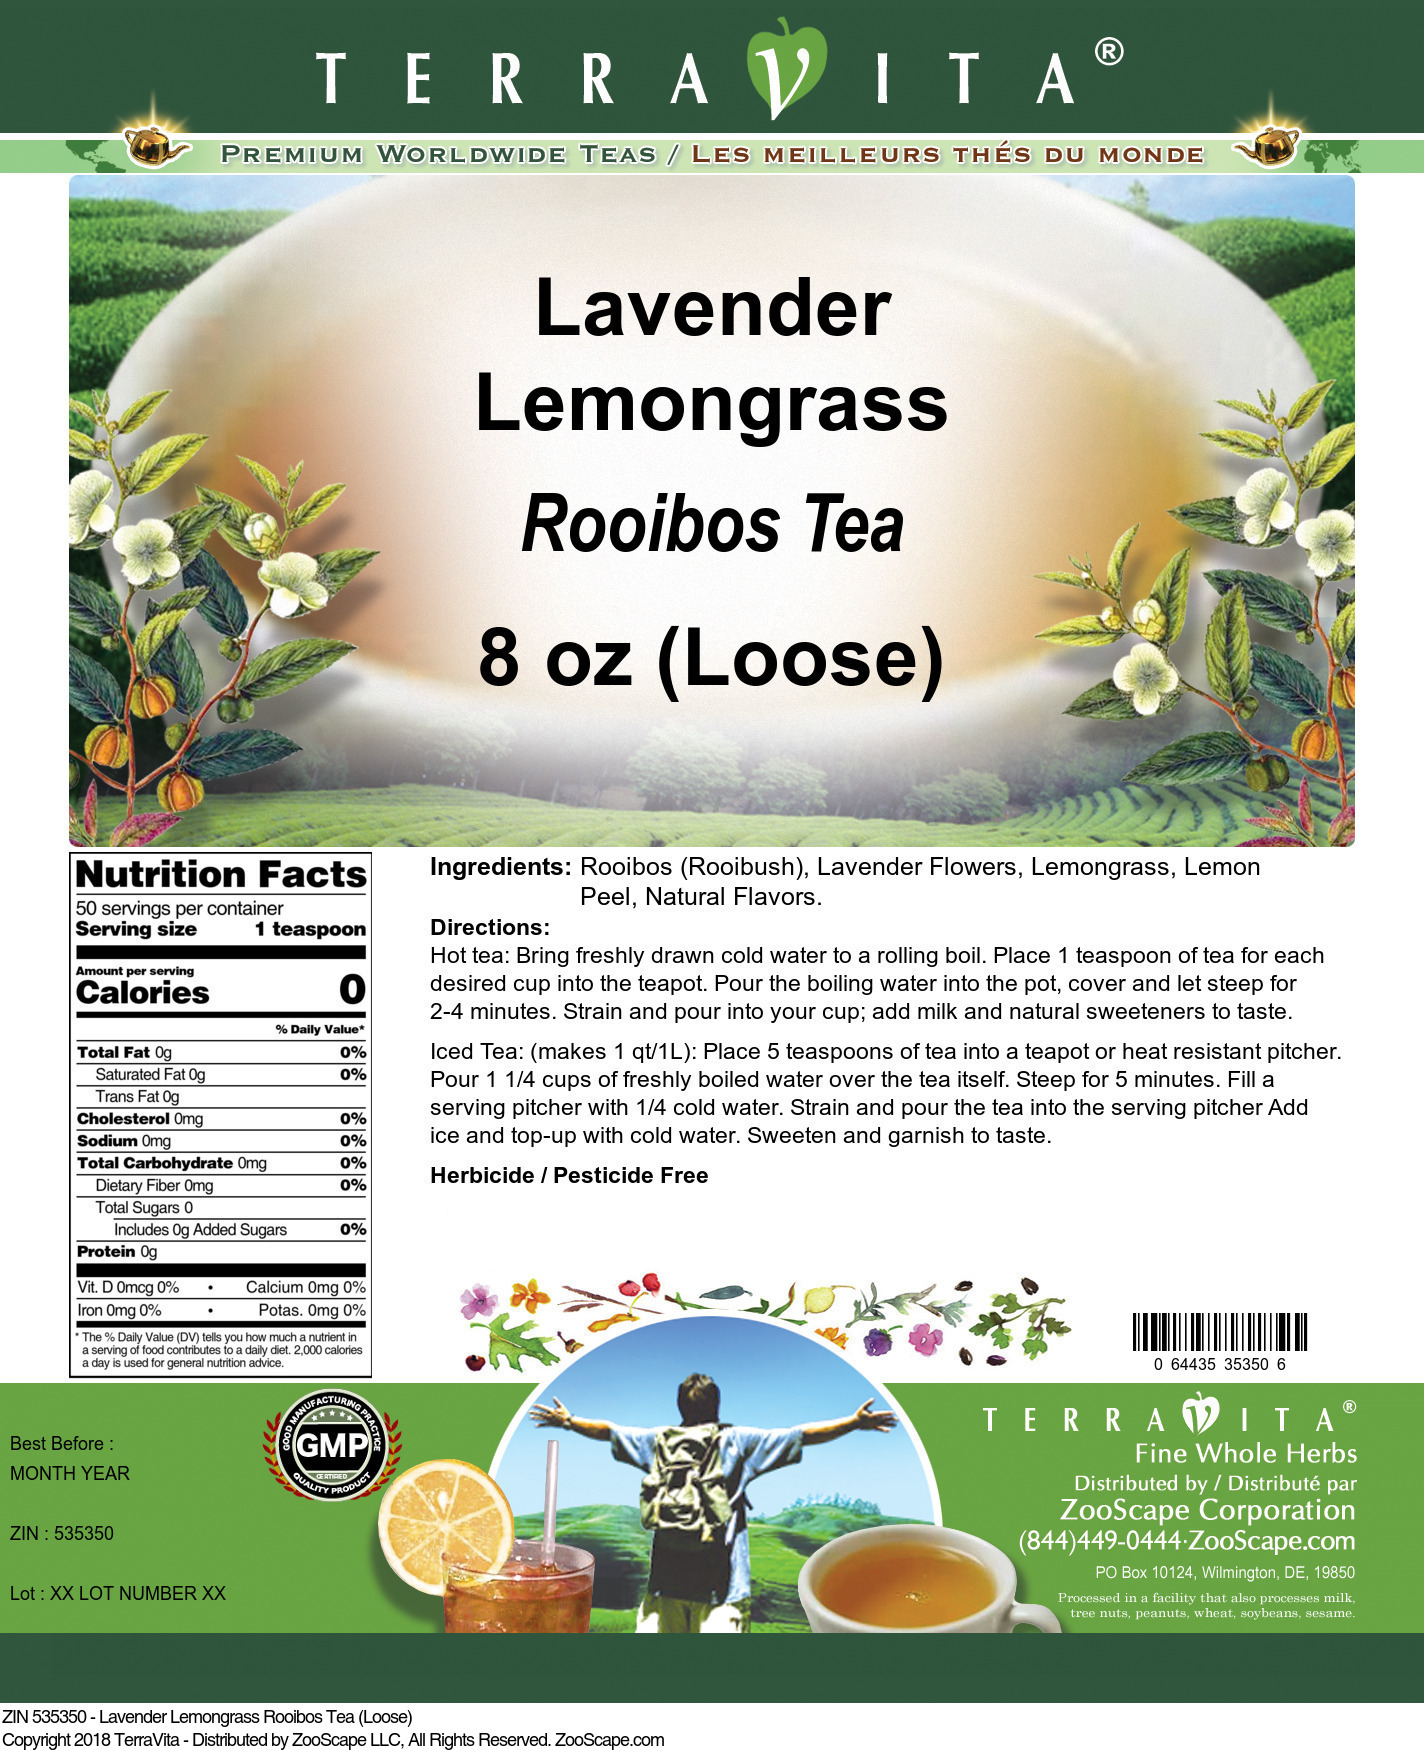 Lavender Lemongrass Rooibos Tea (Loose)